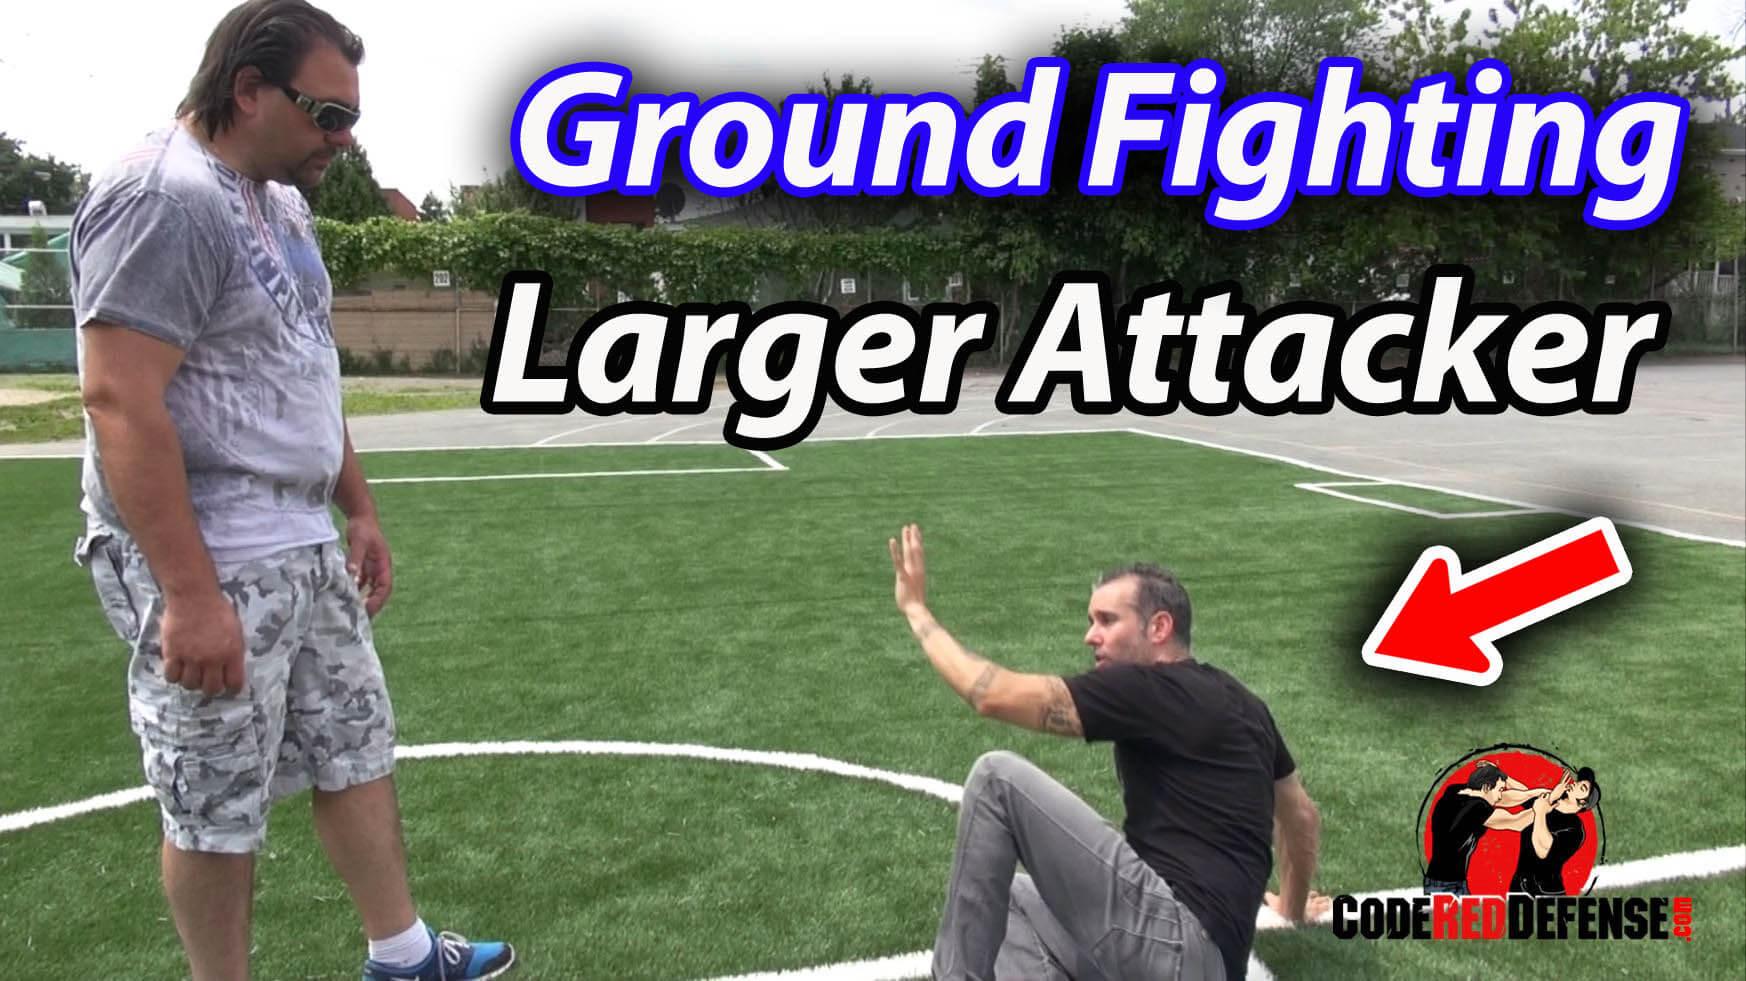 ground fighting self defense